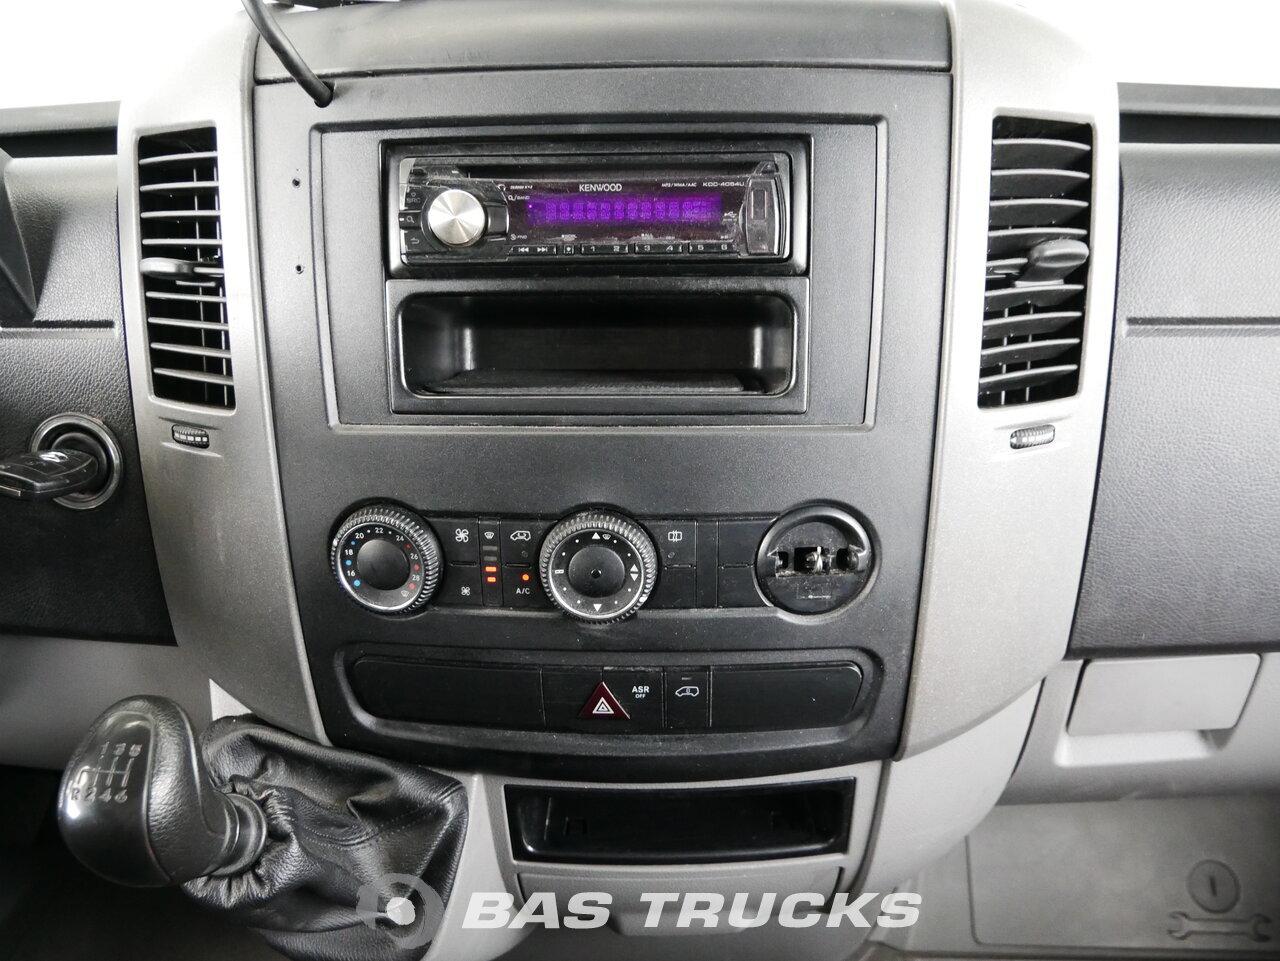 Mercedes Sprinter Light Commercial Vehicle 14900 Bas Vans 2012 Van Fuel Filter Photo Of Used